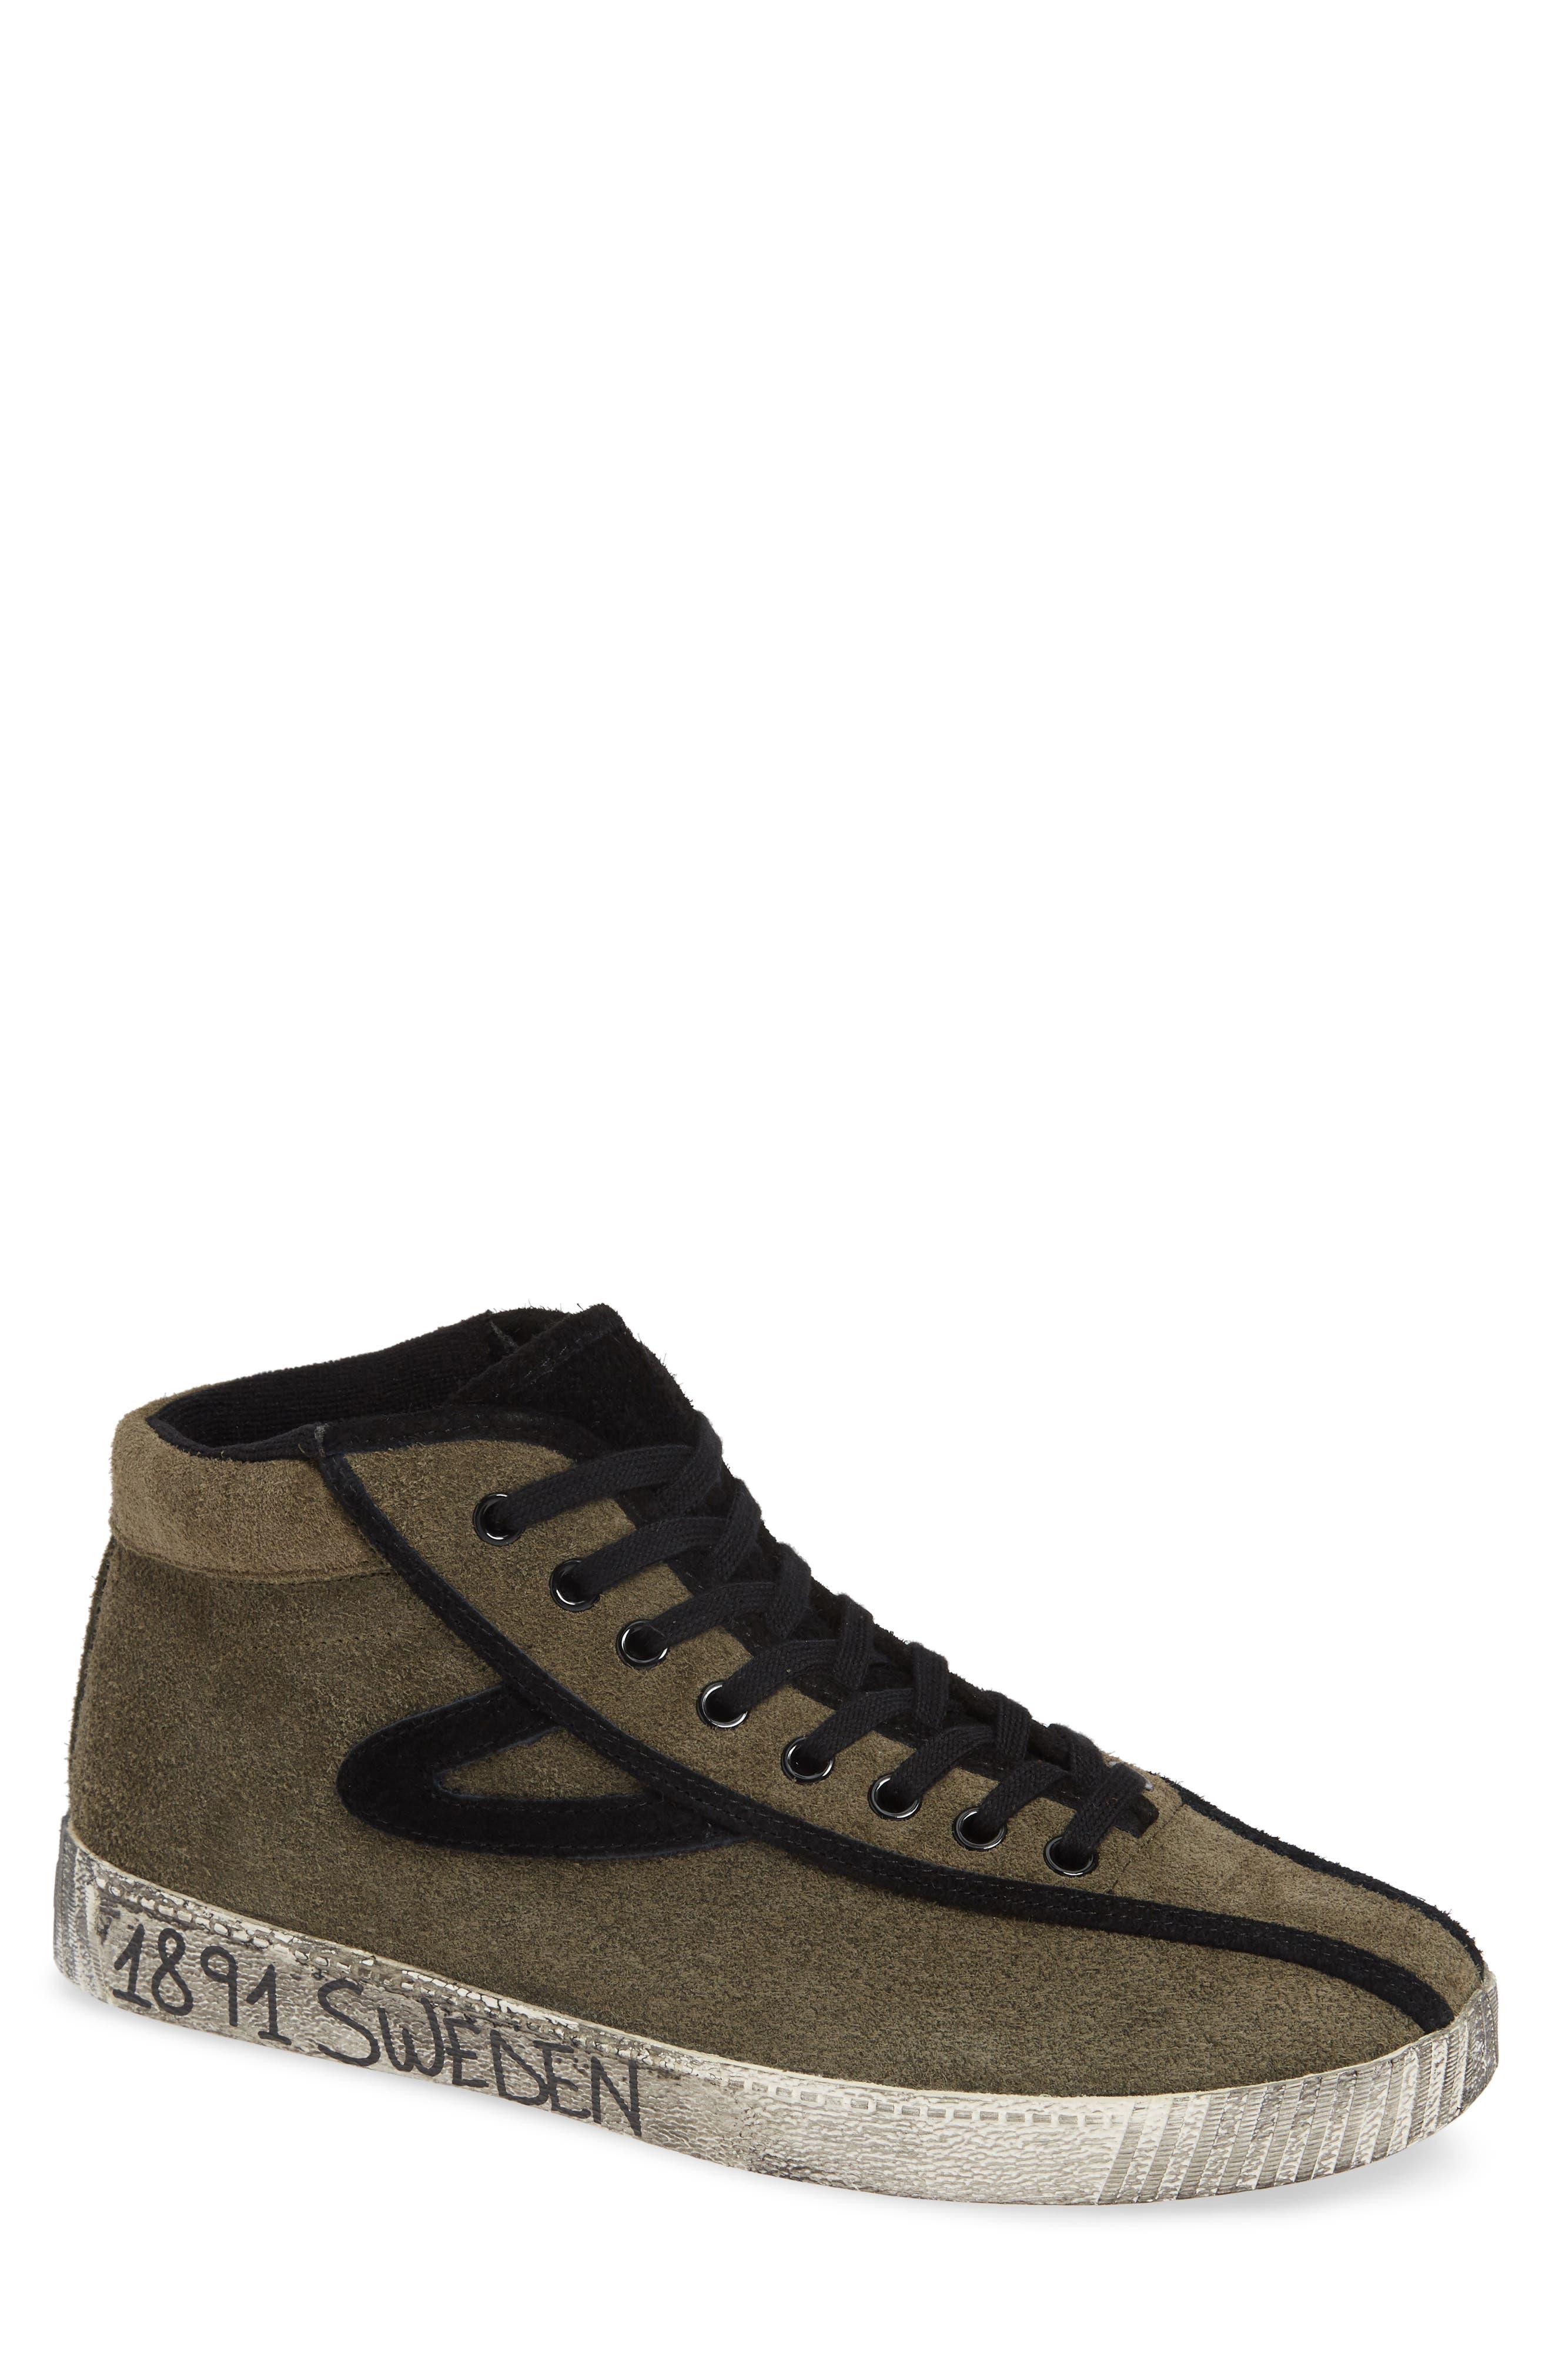 Nylite Hi 21 High Top Sneaker,                             Main thumbnail 1, color,                             OLIVE/ BLACK SUEDE